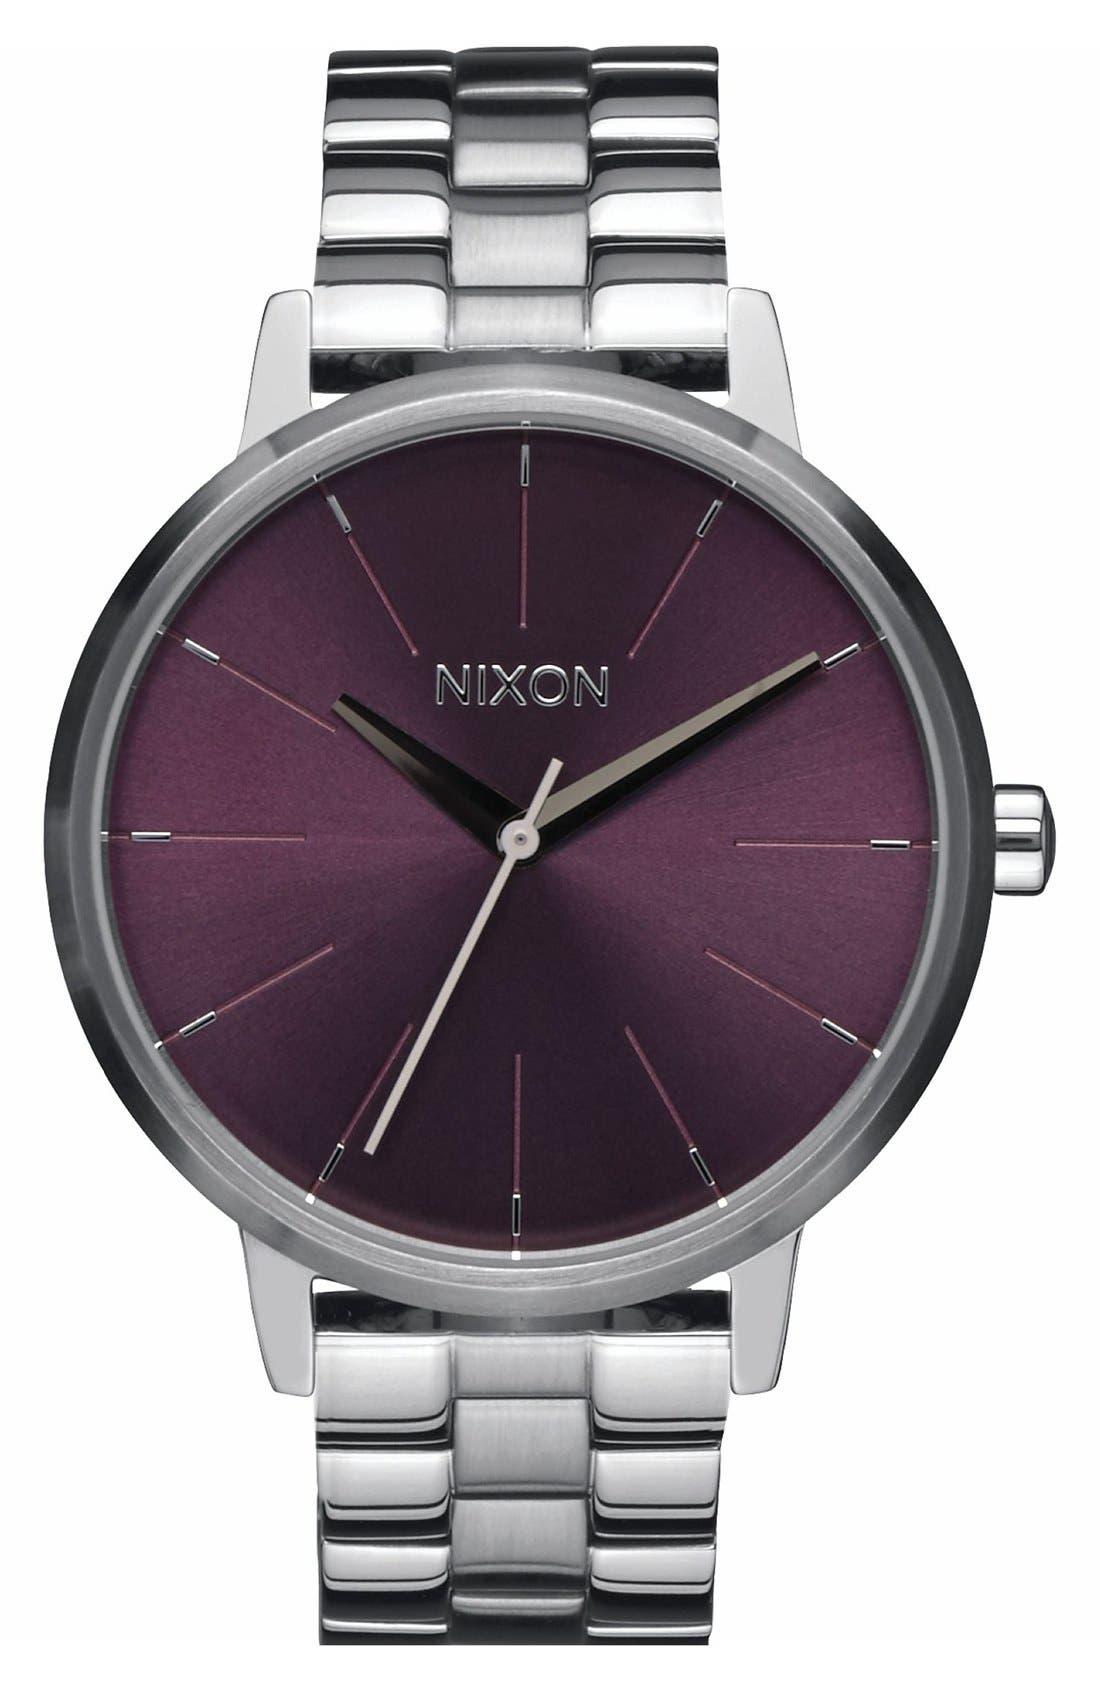 Main Image - Nixon 'The Kensingon' Bracelet Watch, 37mm